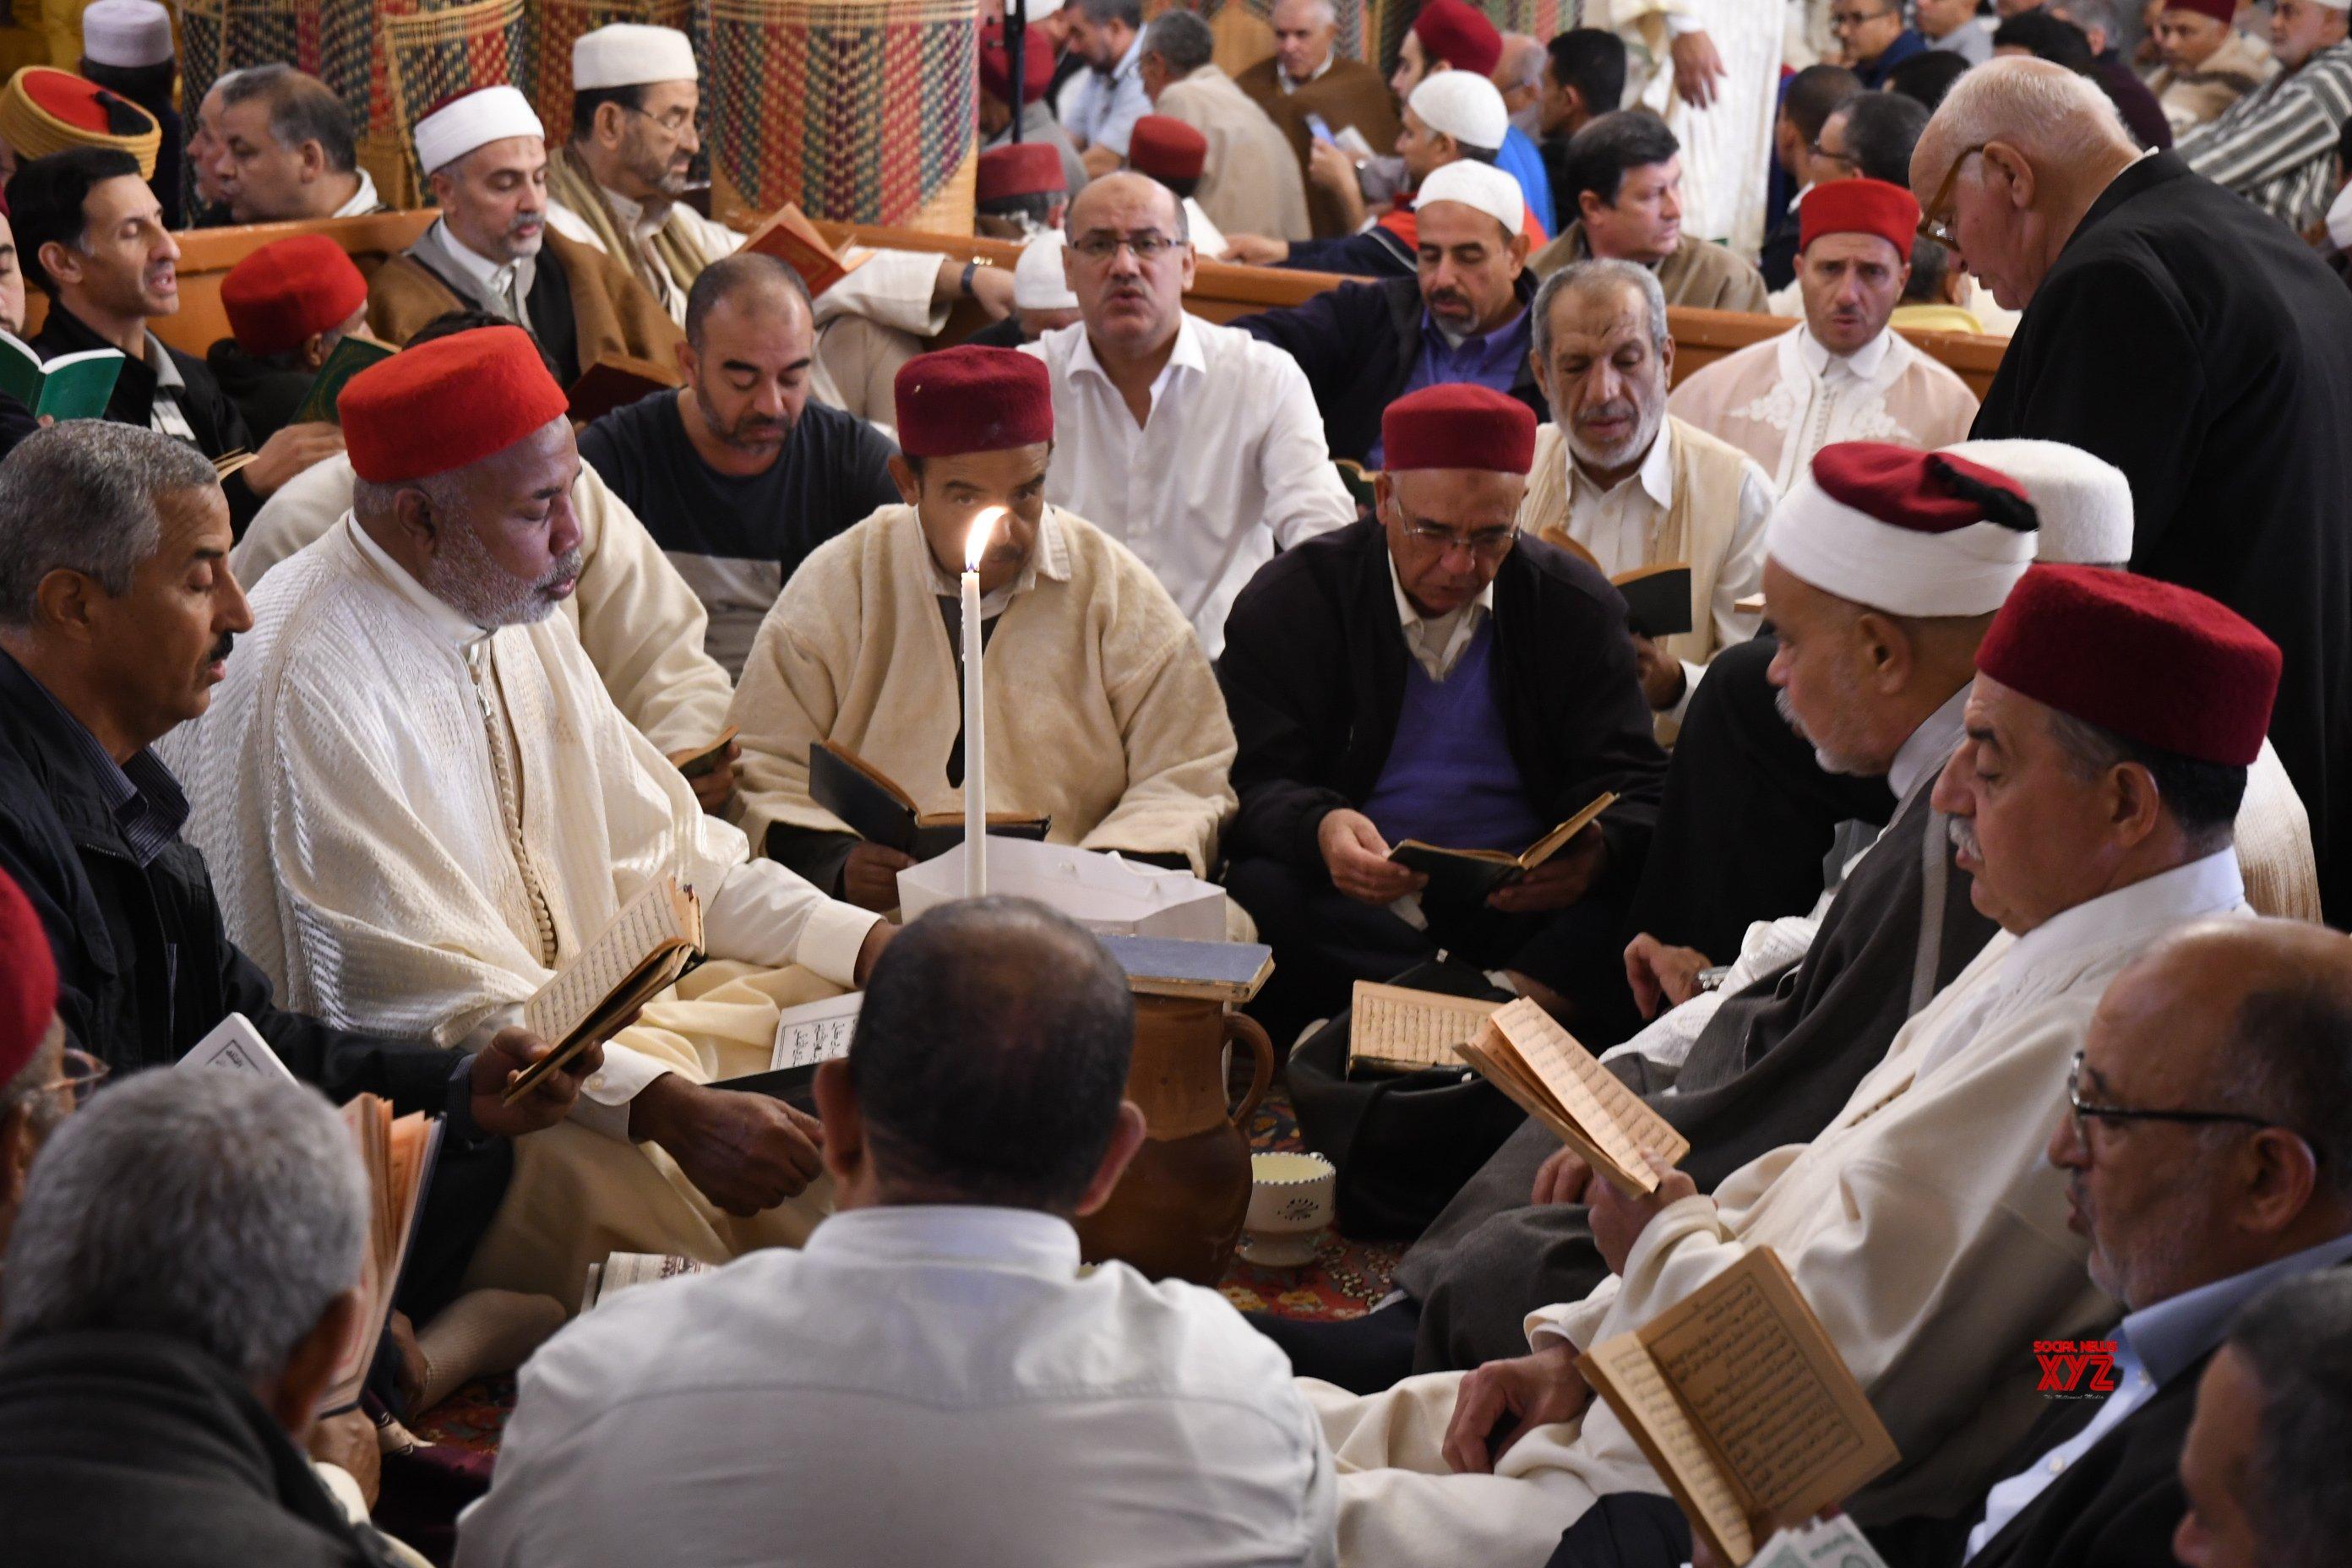 TUNISIA - TUNIS - HOLIDAY - MAWLID AL - NABI - CELEBRATION #Gallery